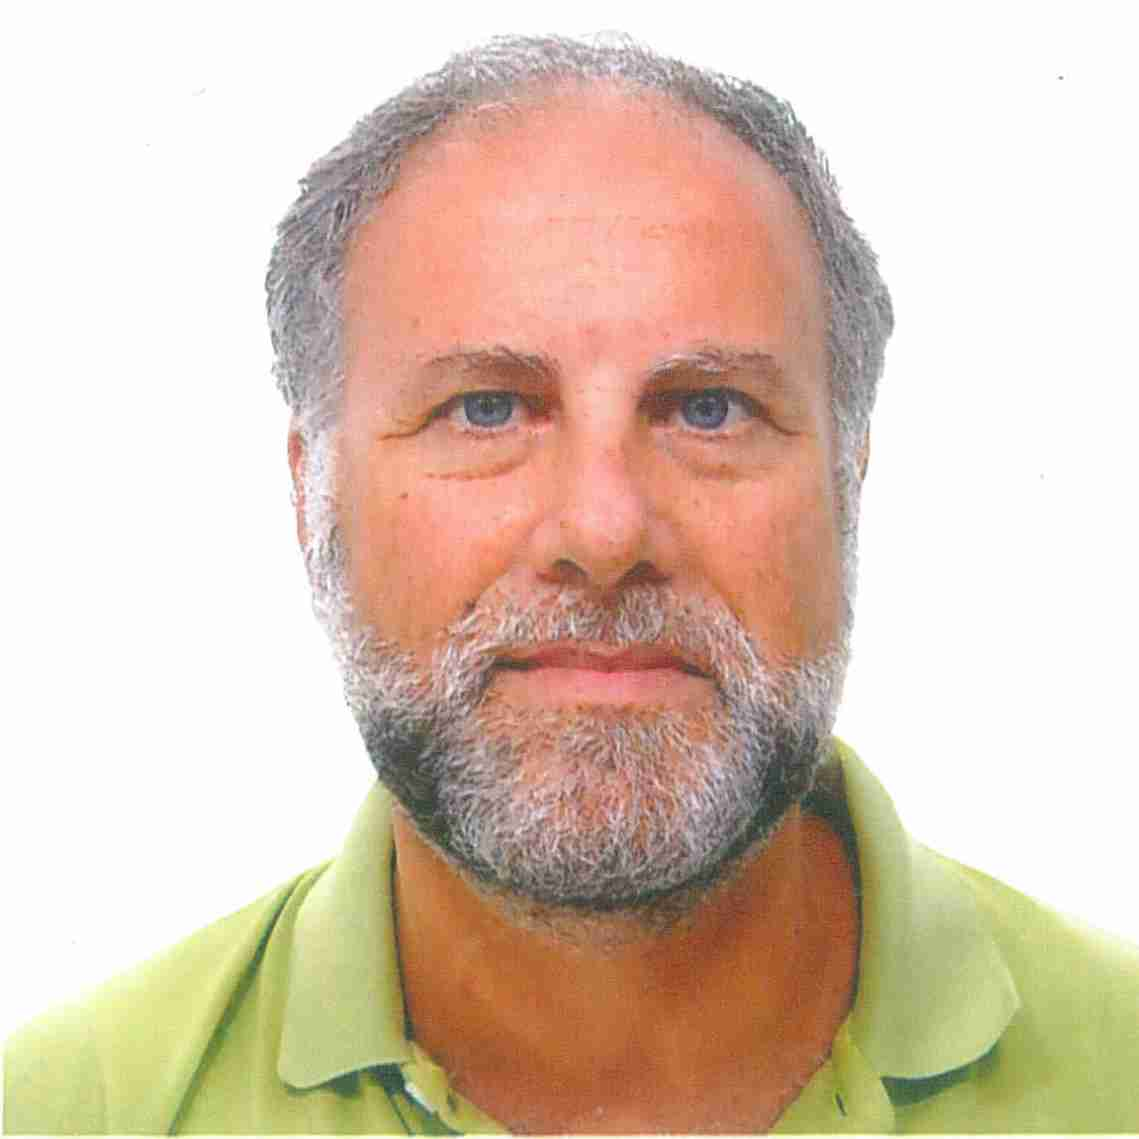 Dr. Stefano Scala